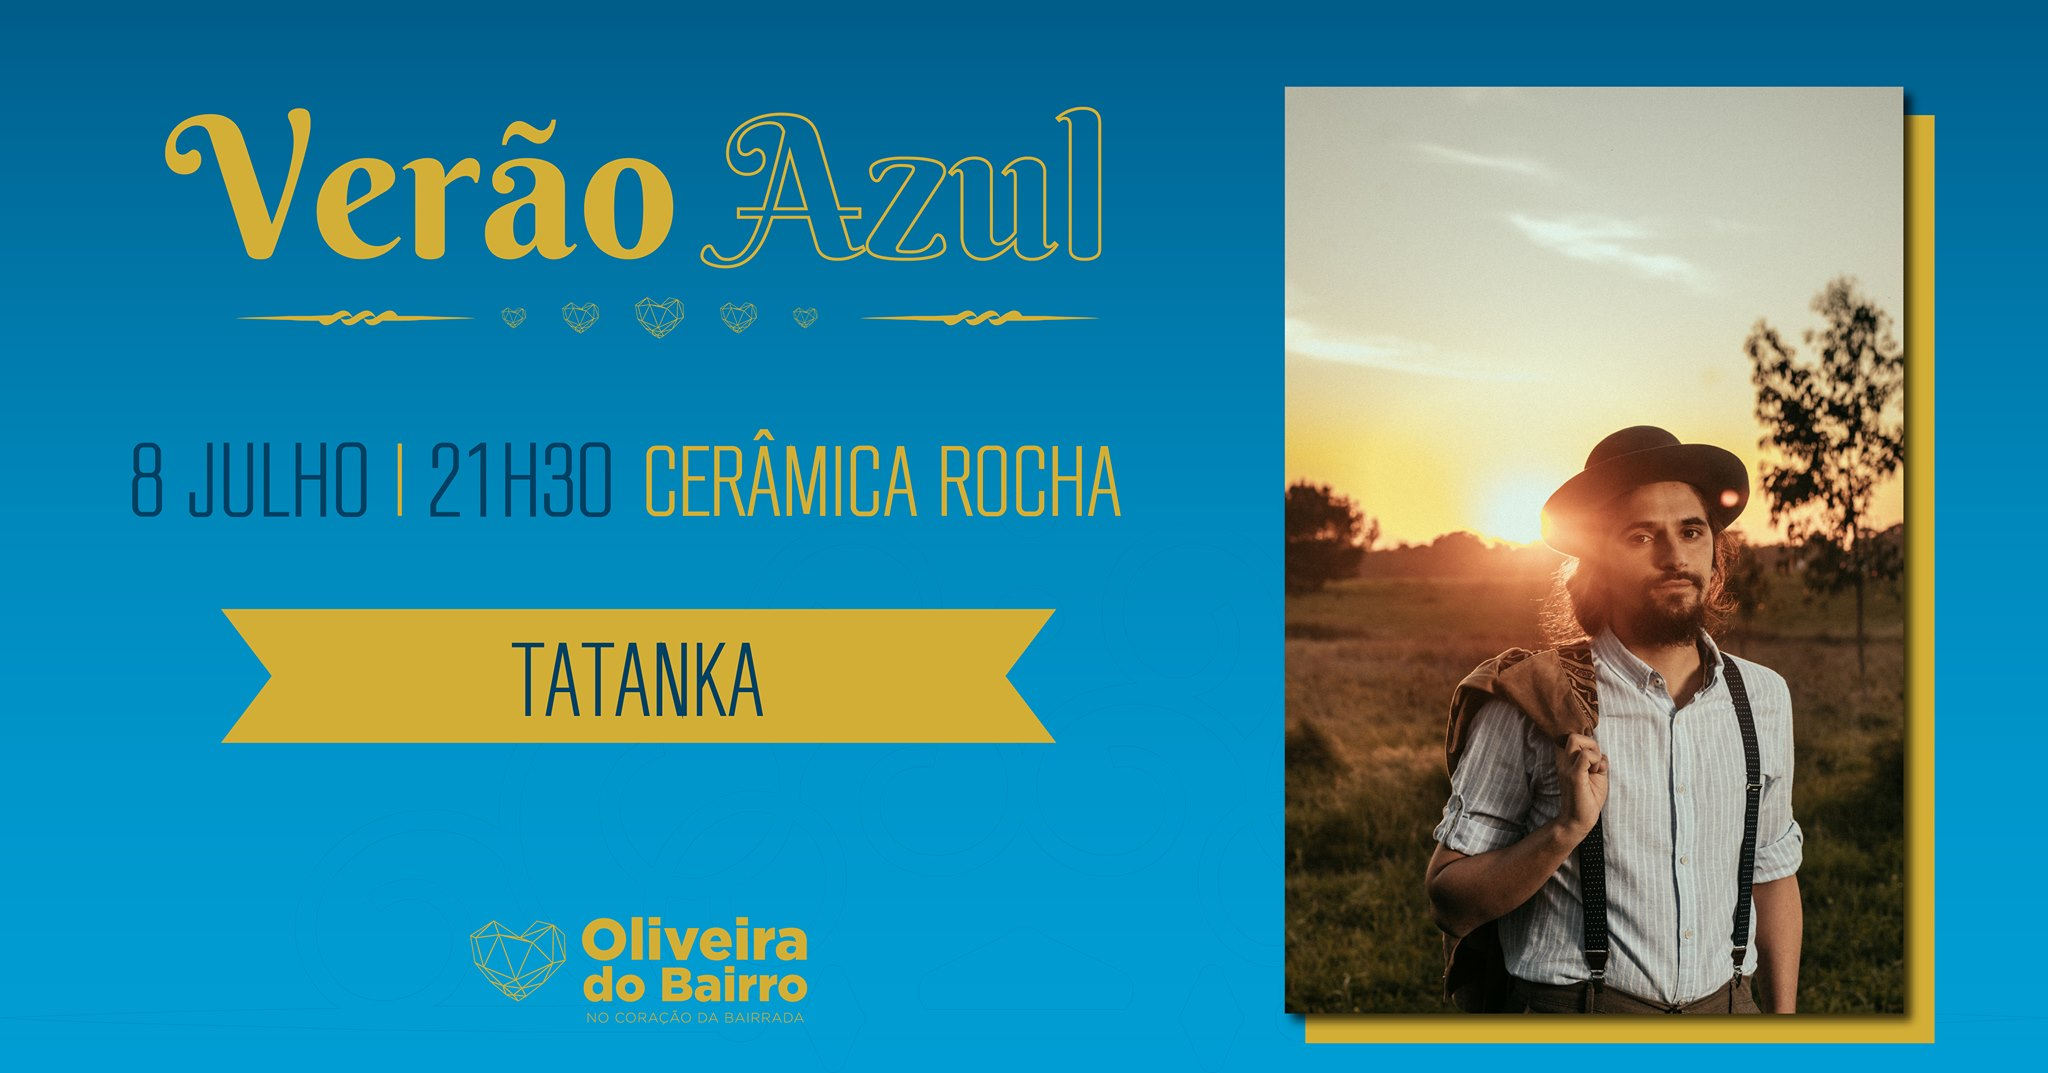 Verão Azul - Tatanka / Cerâmica Rocha